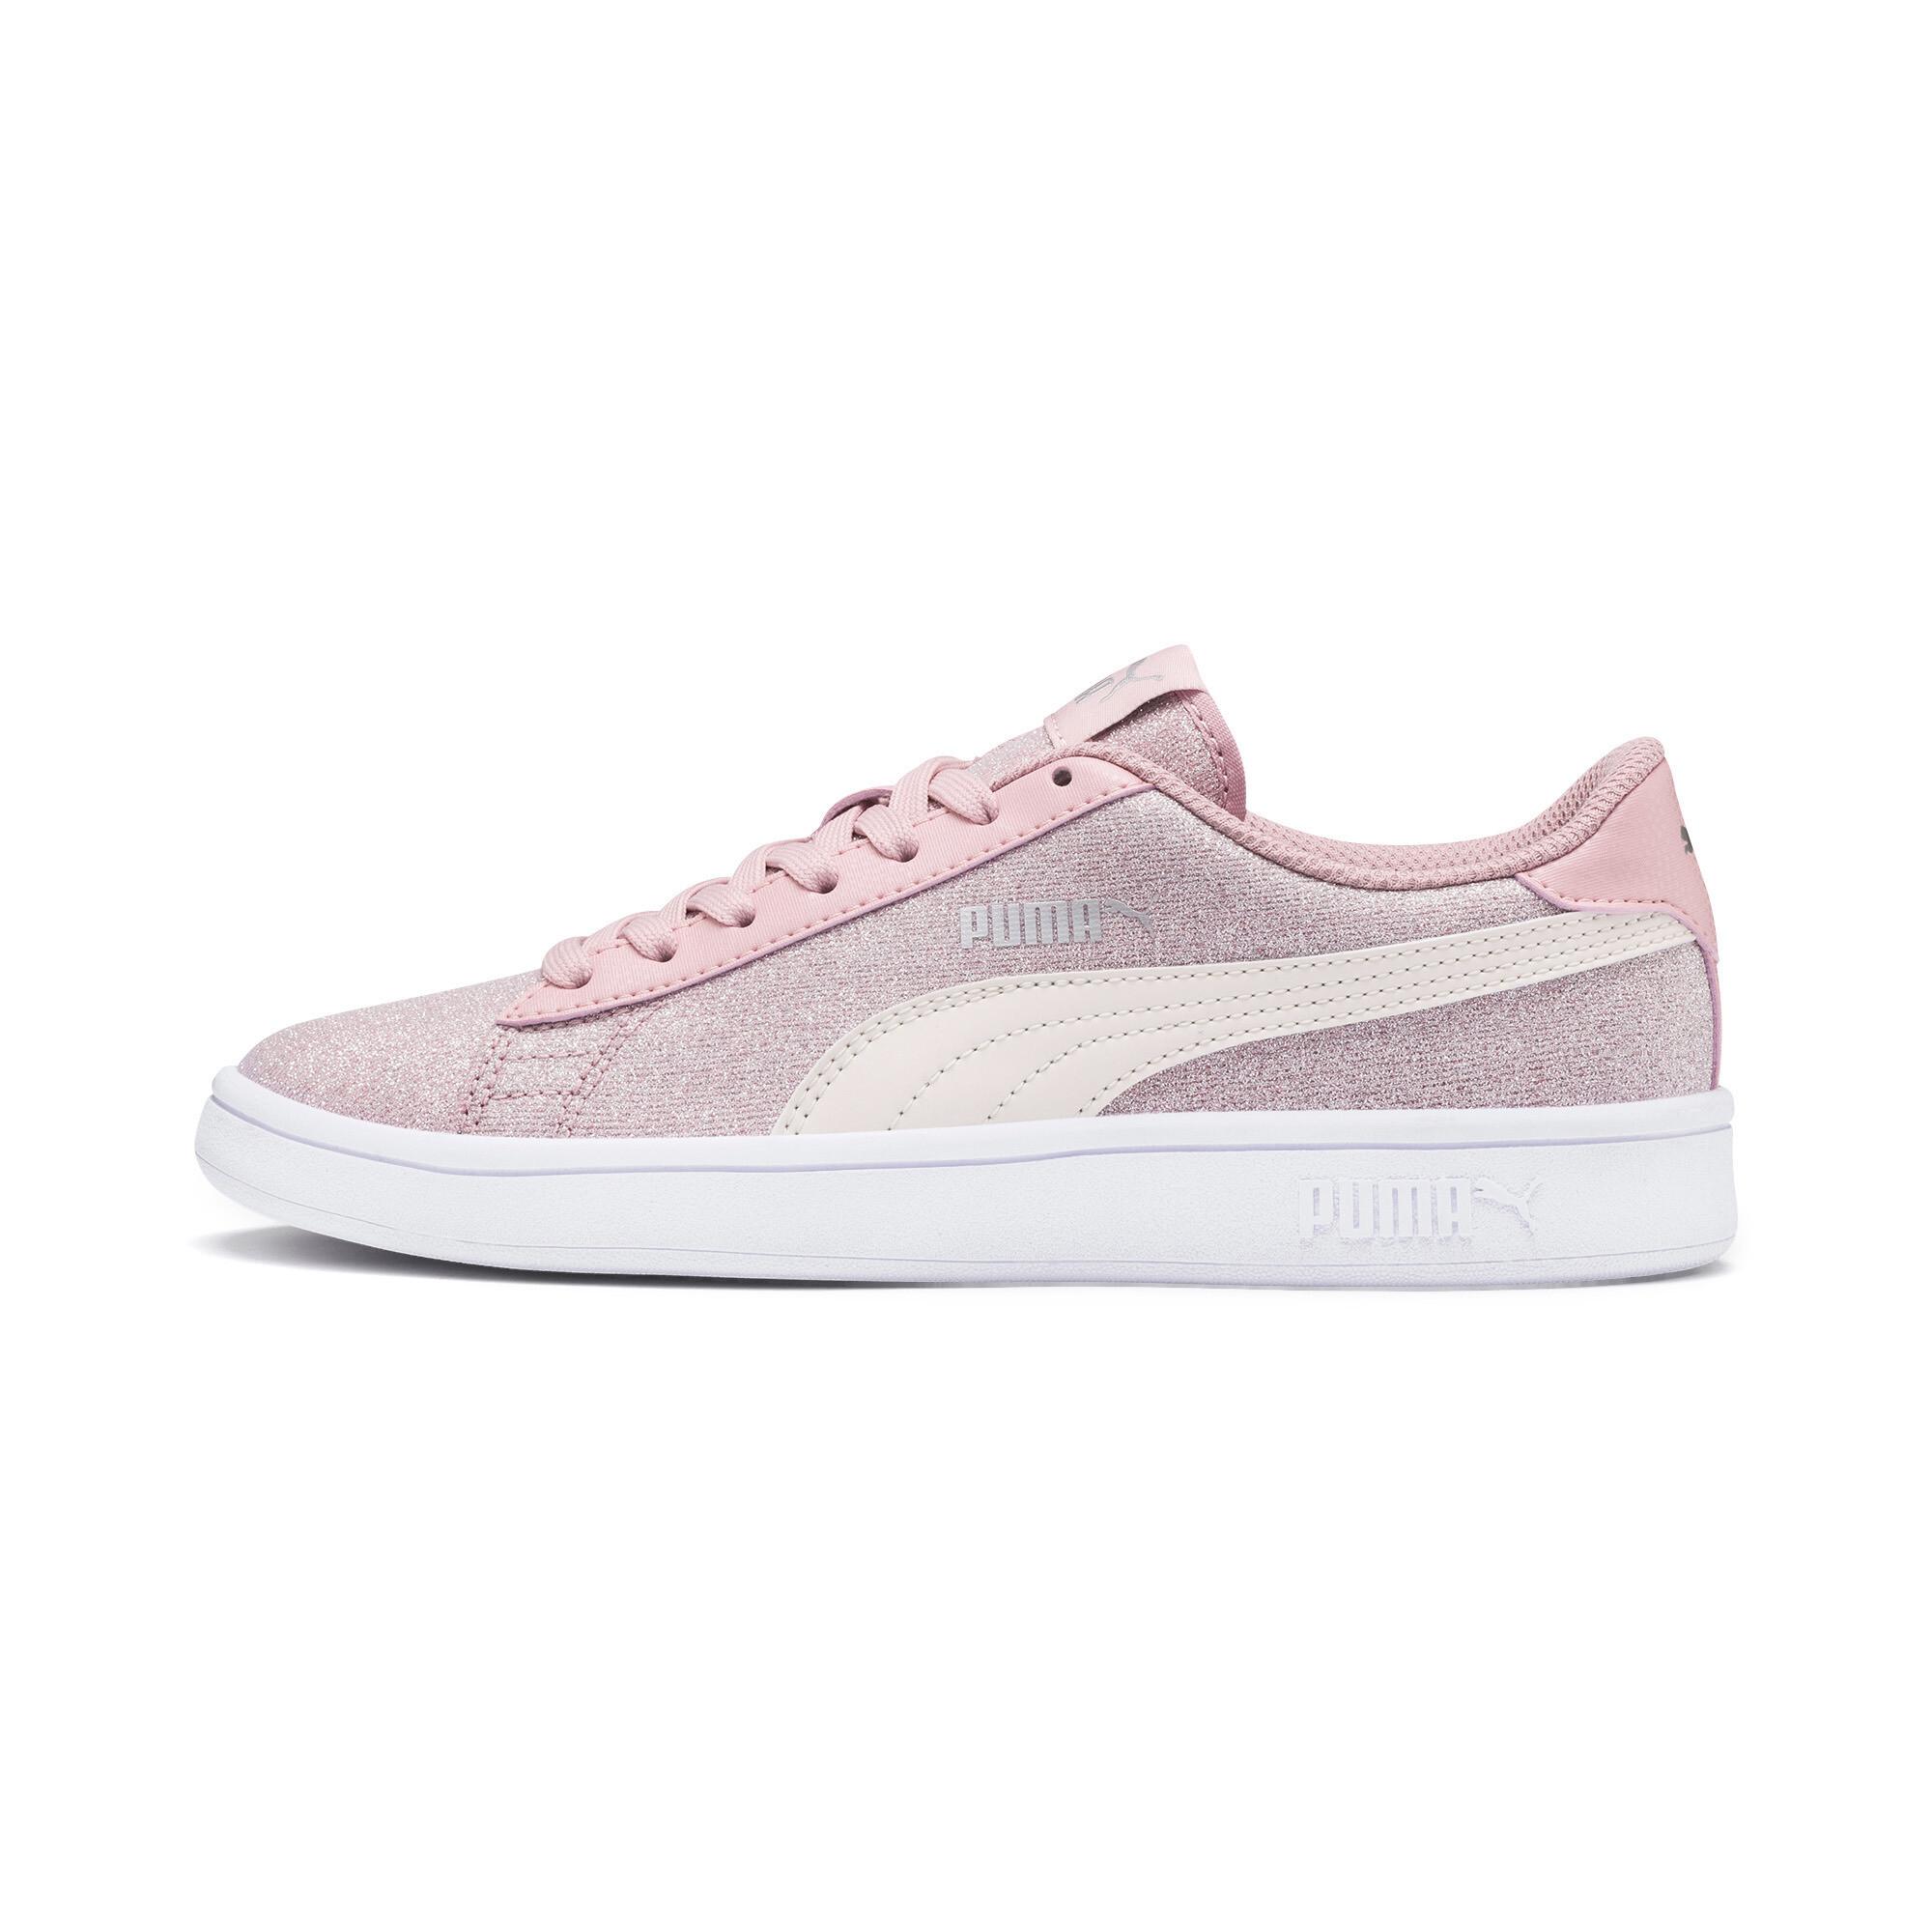 PUMA-Smash-v2-Glitz-Glam-Sneakers-JR-Girls-Shoe-Kids thumbnail 14